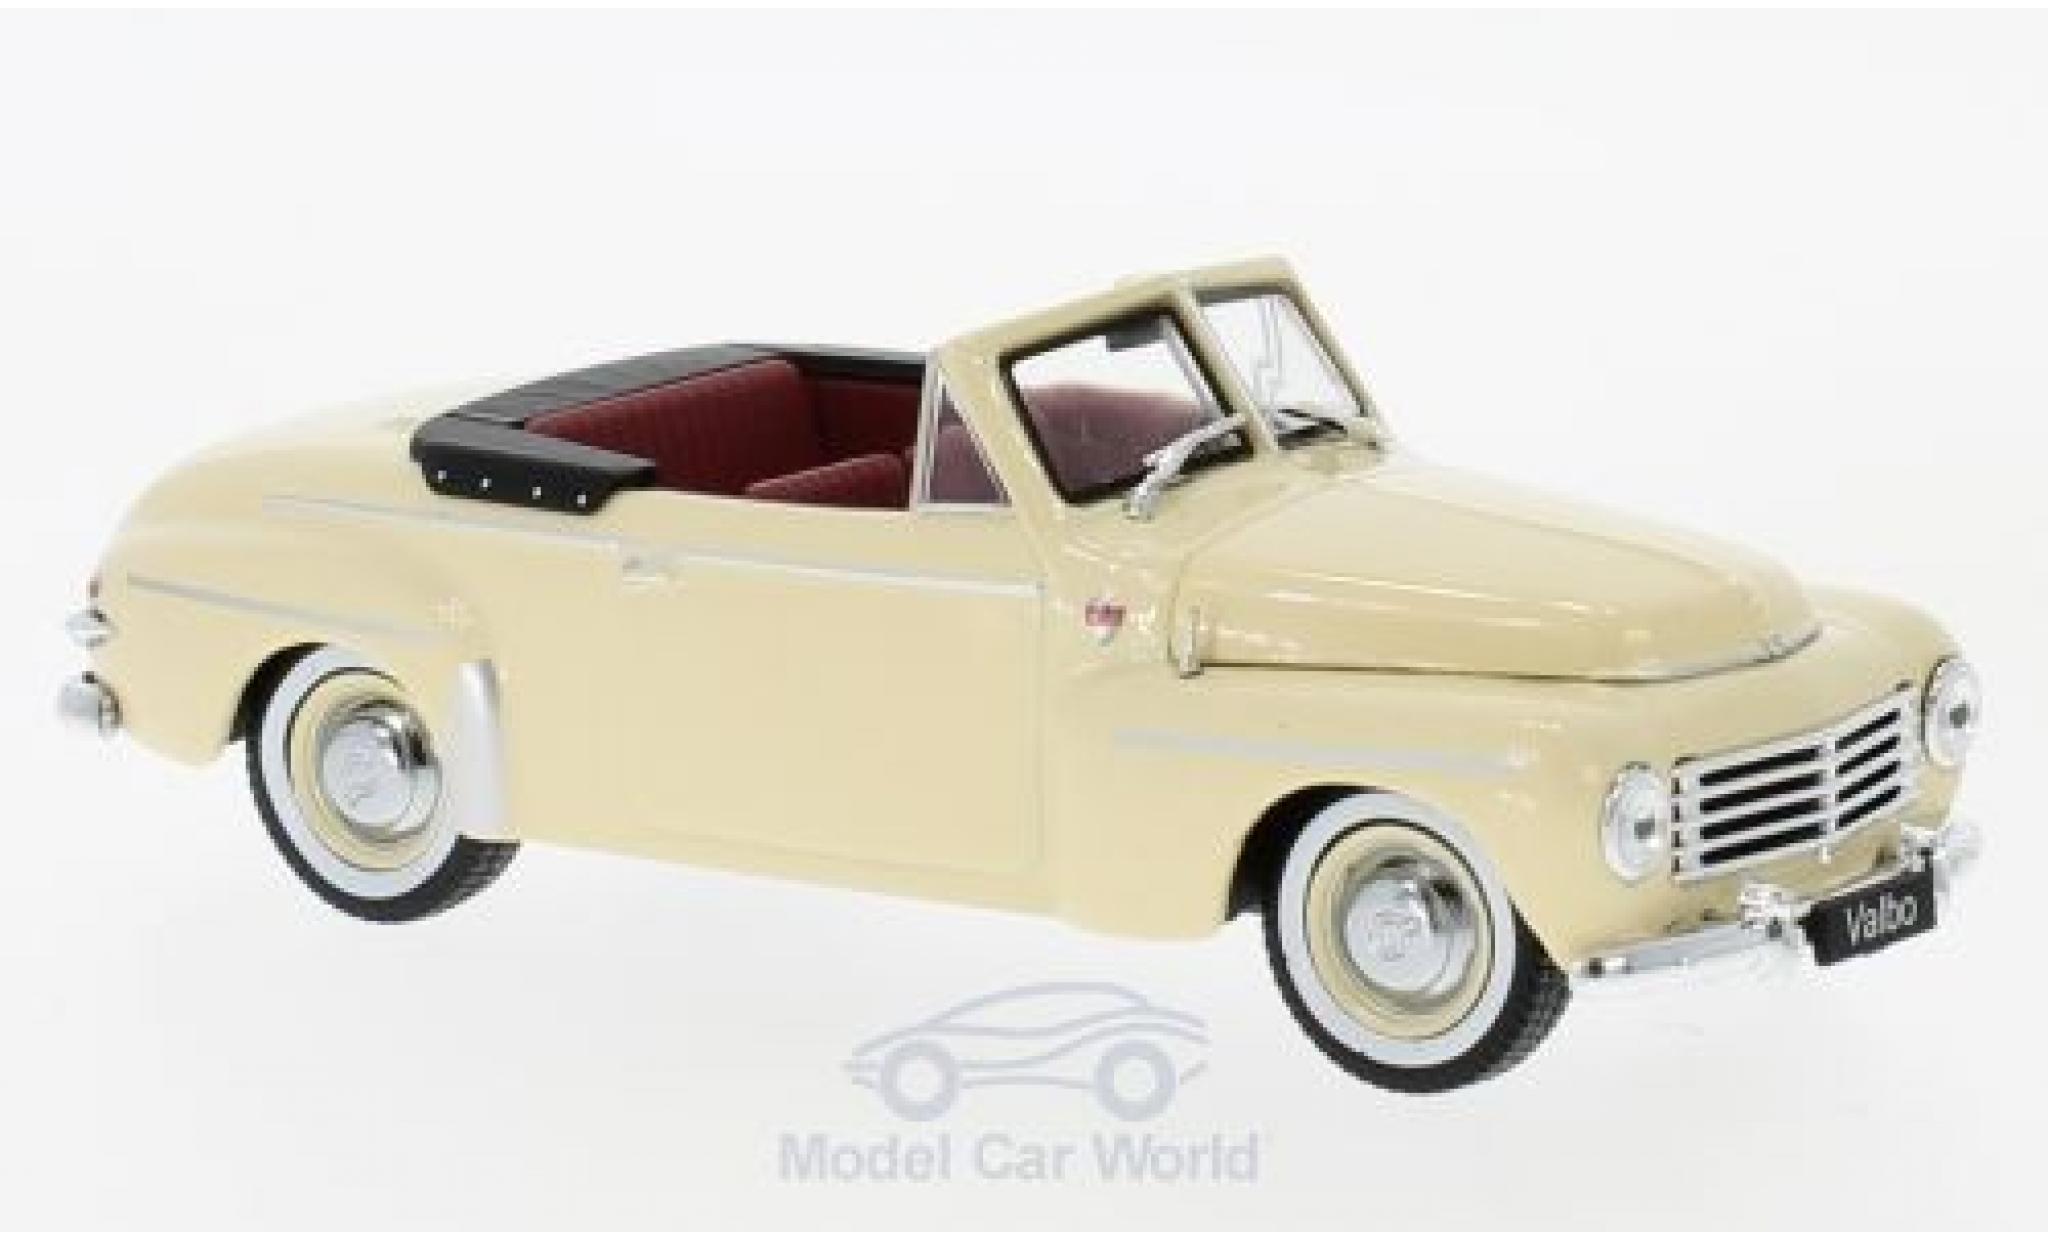 Volvo PV 445 1/43 WhiteBox Cabriolet Valbo beige 1953